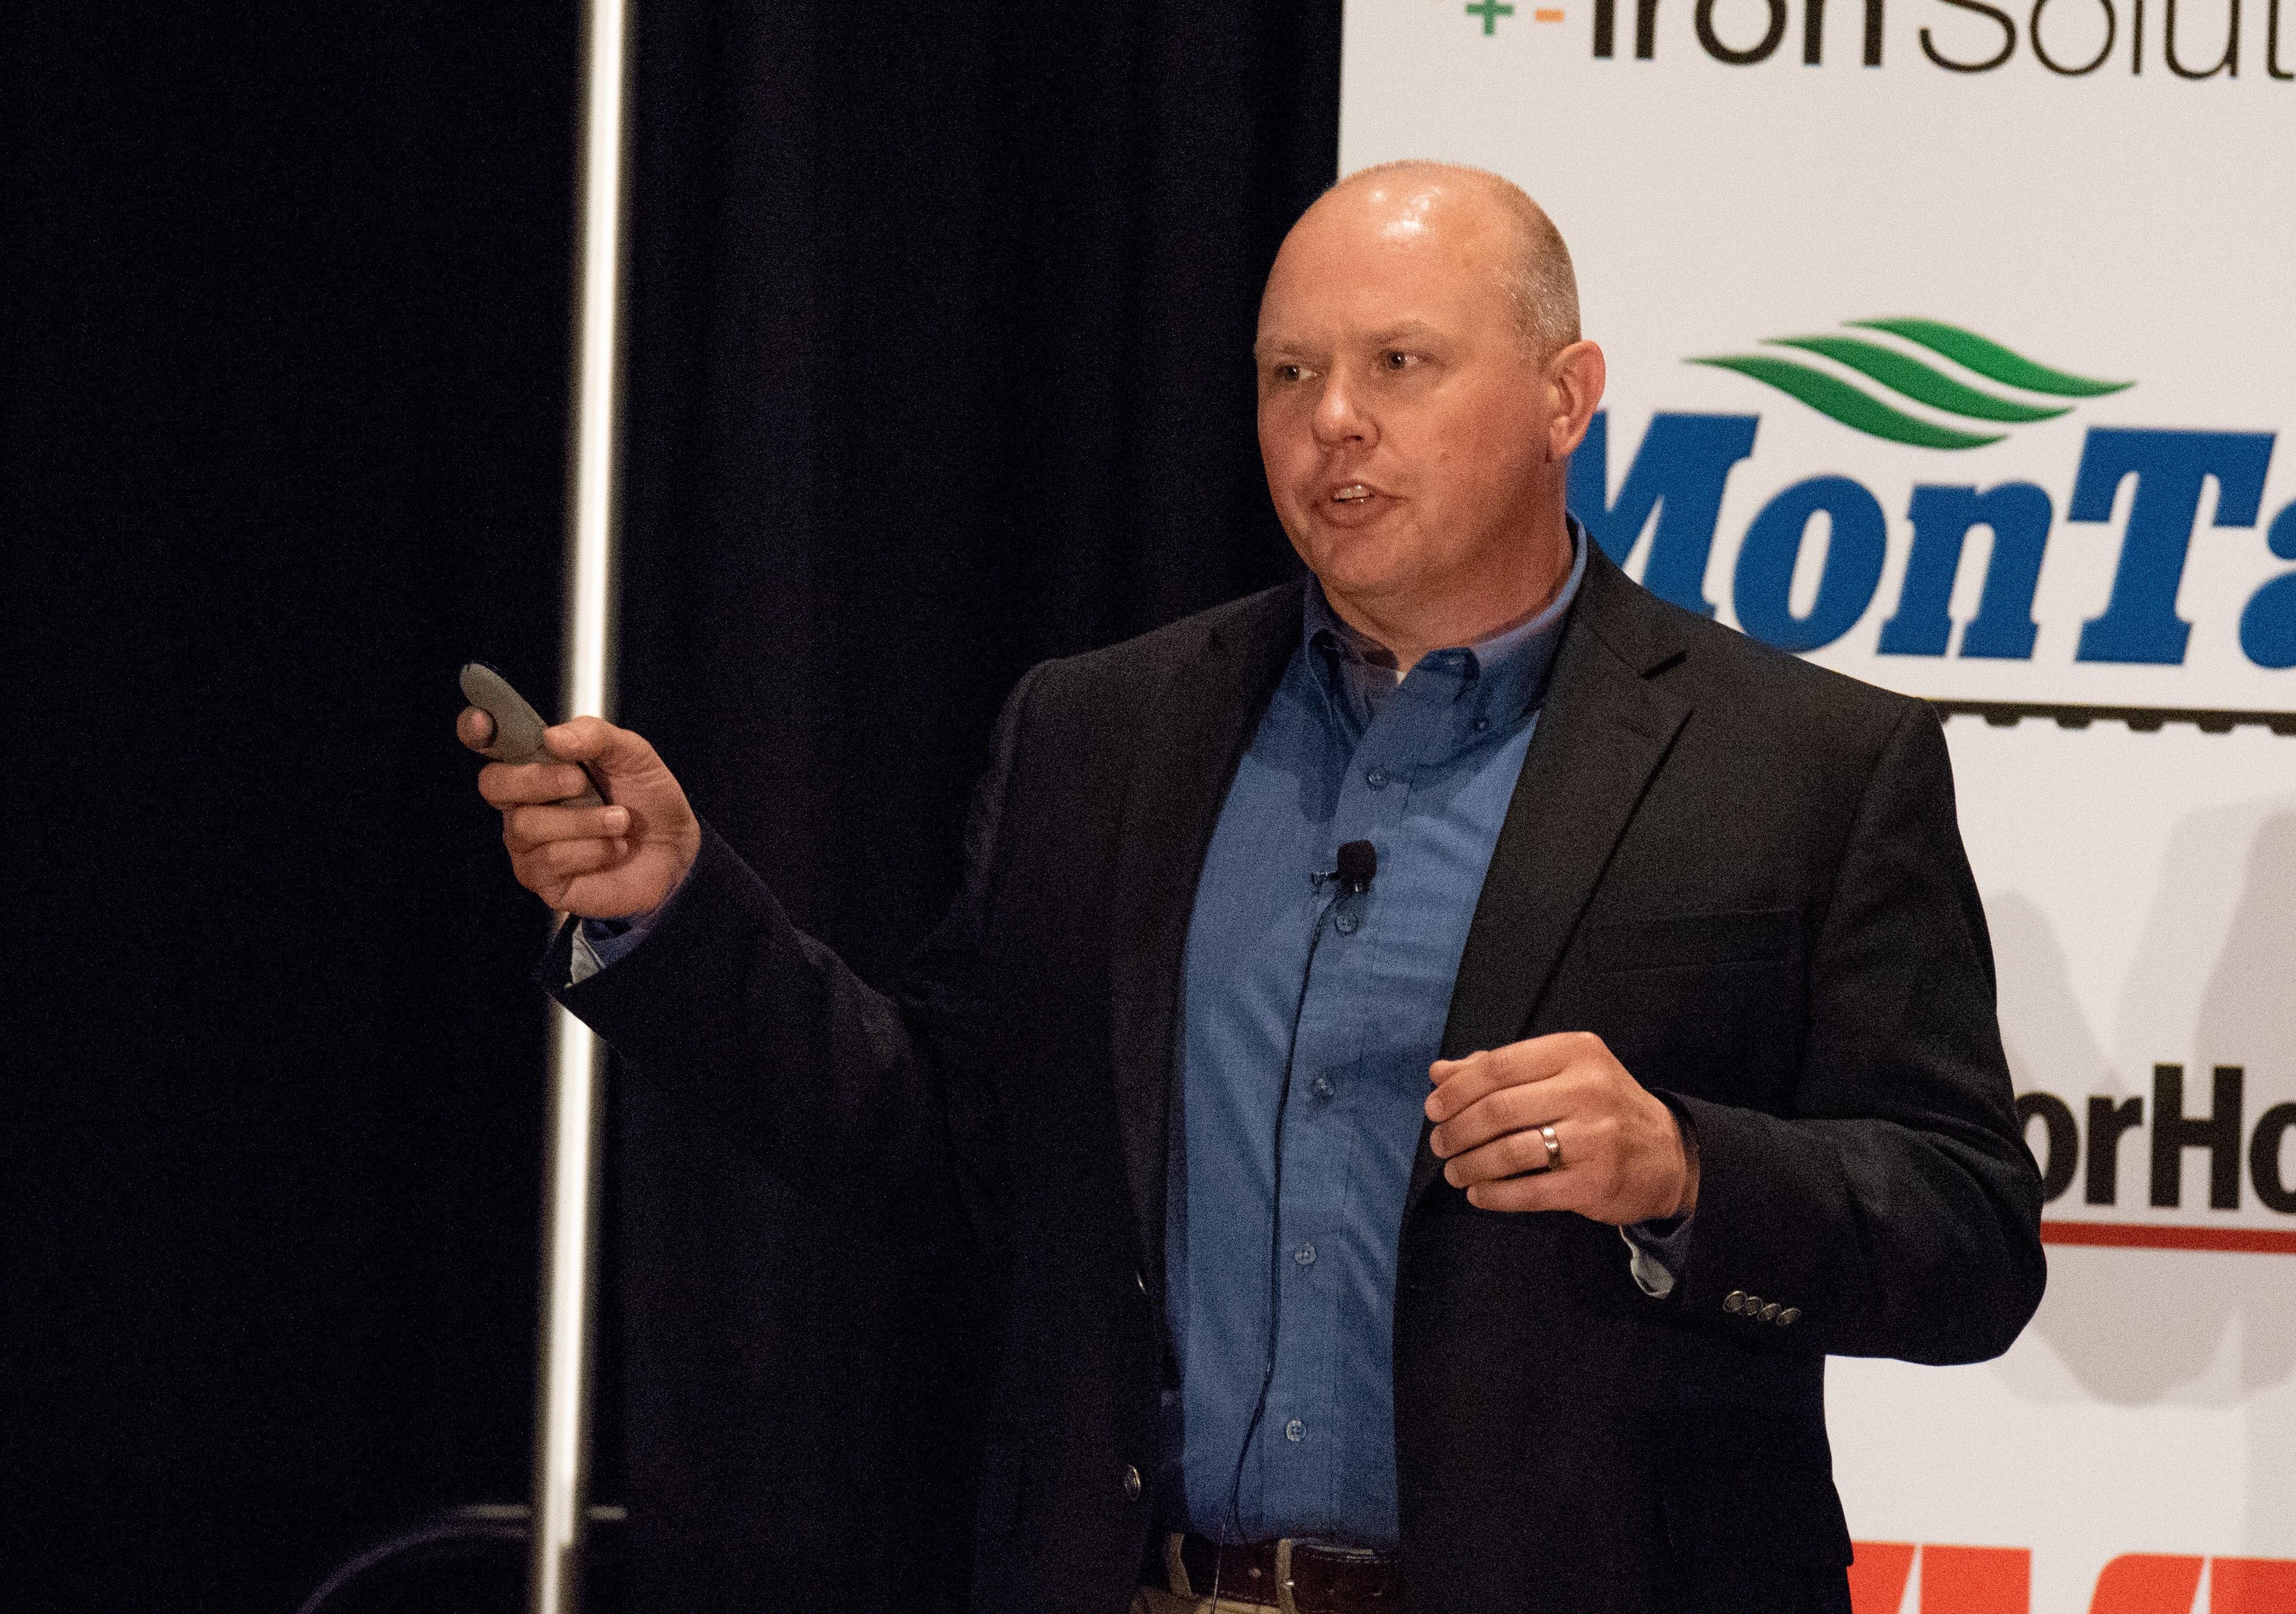 Shawn Skaggs Speaker Photo